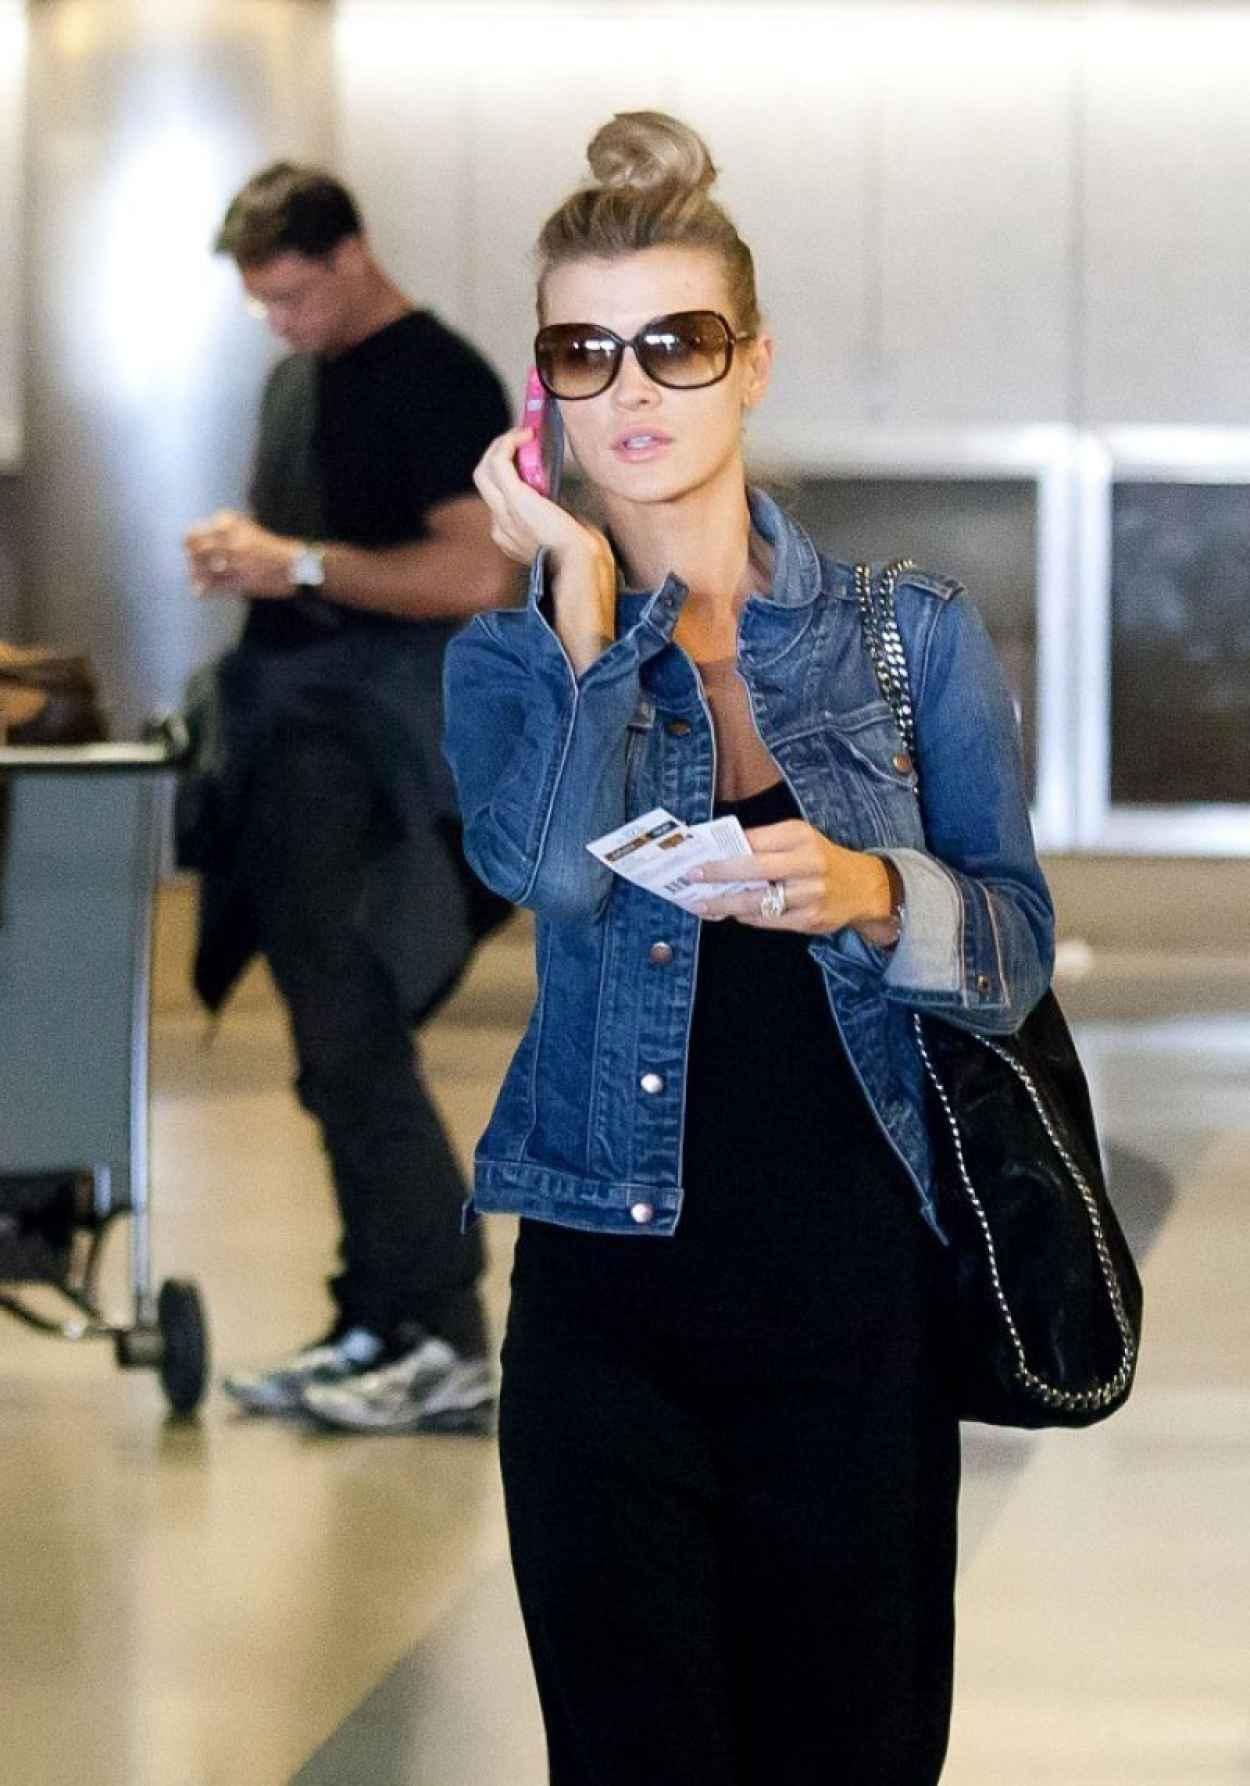 Joanna Krupa Street Style - At LAX Airport - December 2015-1